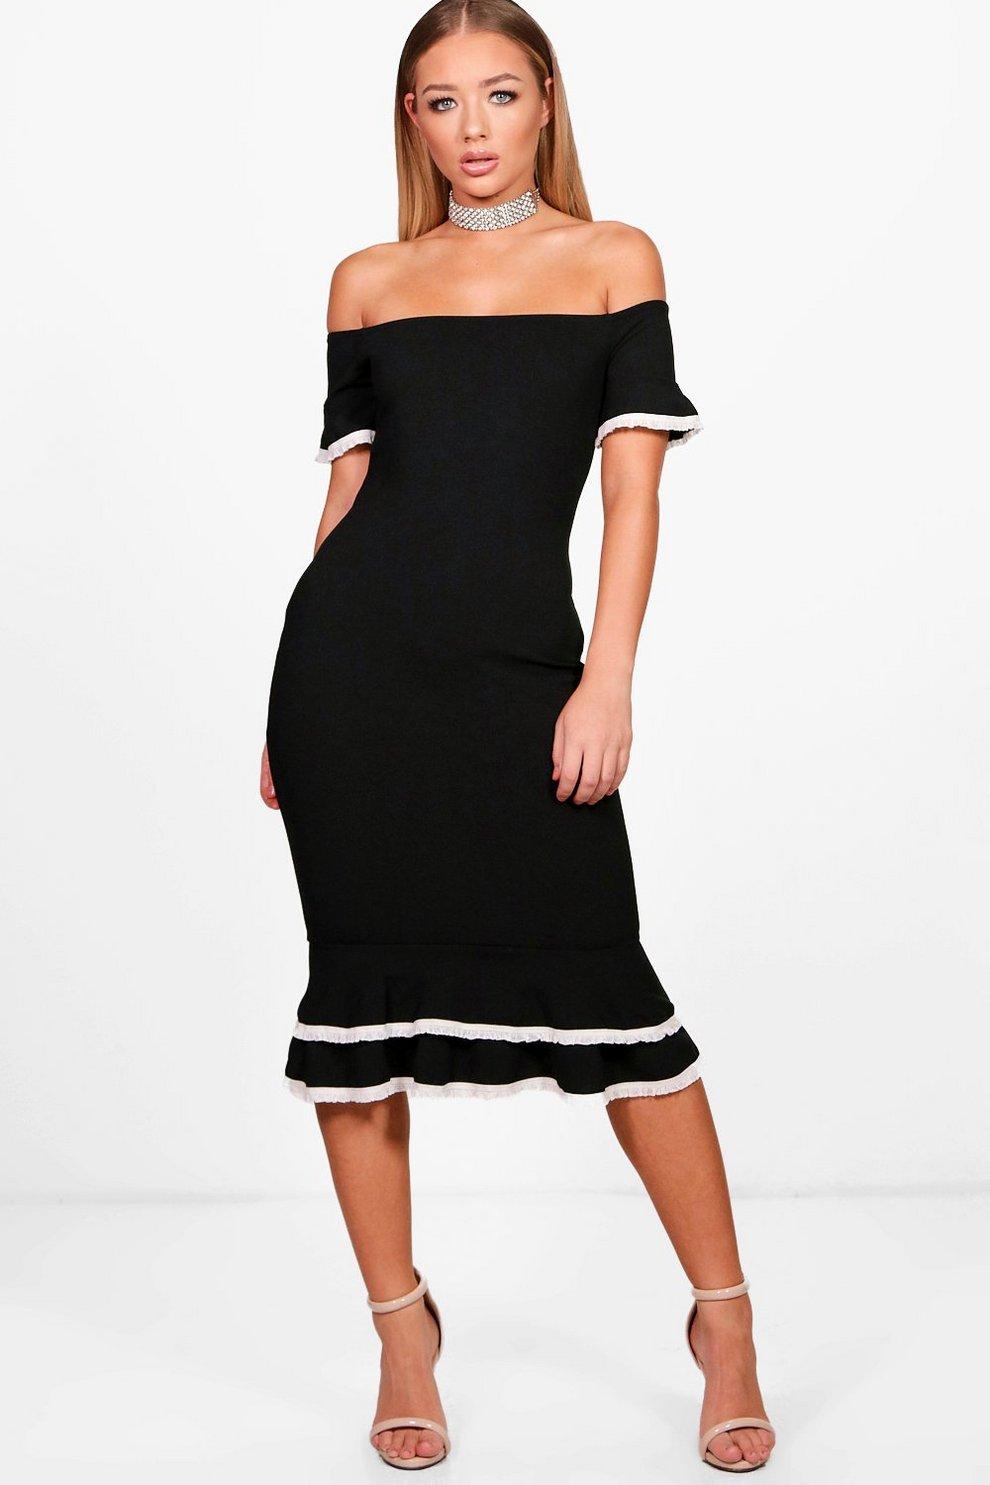 ff29311cf3 Womens Black Bardot Frill Lace Trim Midi Dress. Hover to zoom